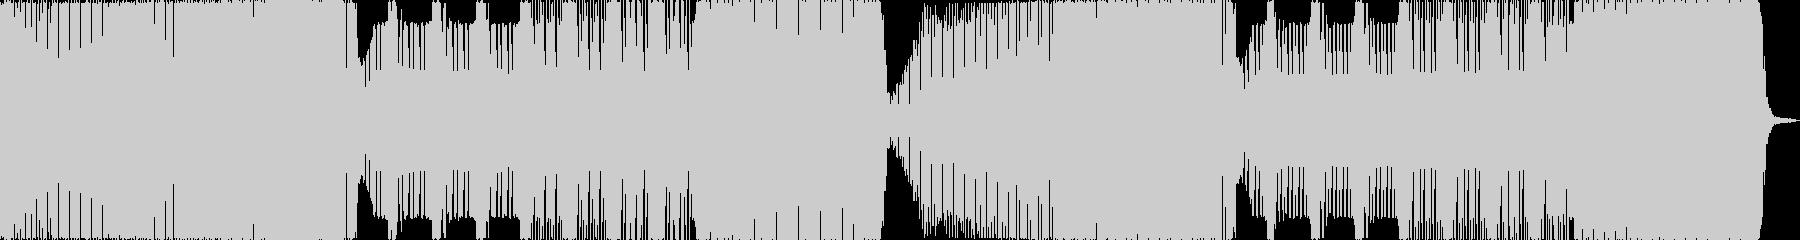 zeddのようなシンプルで乾いたEDMの未再生の波形